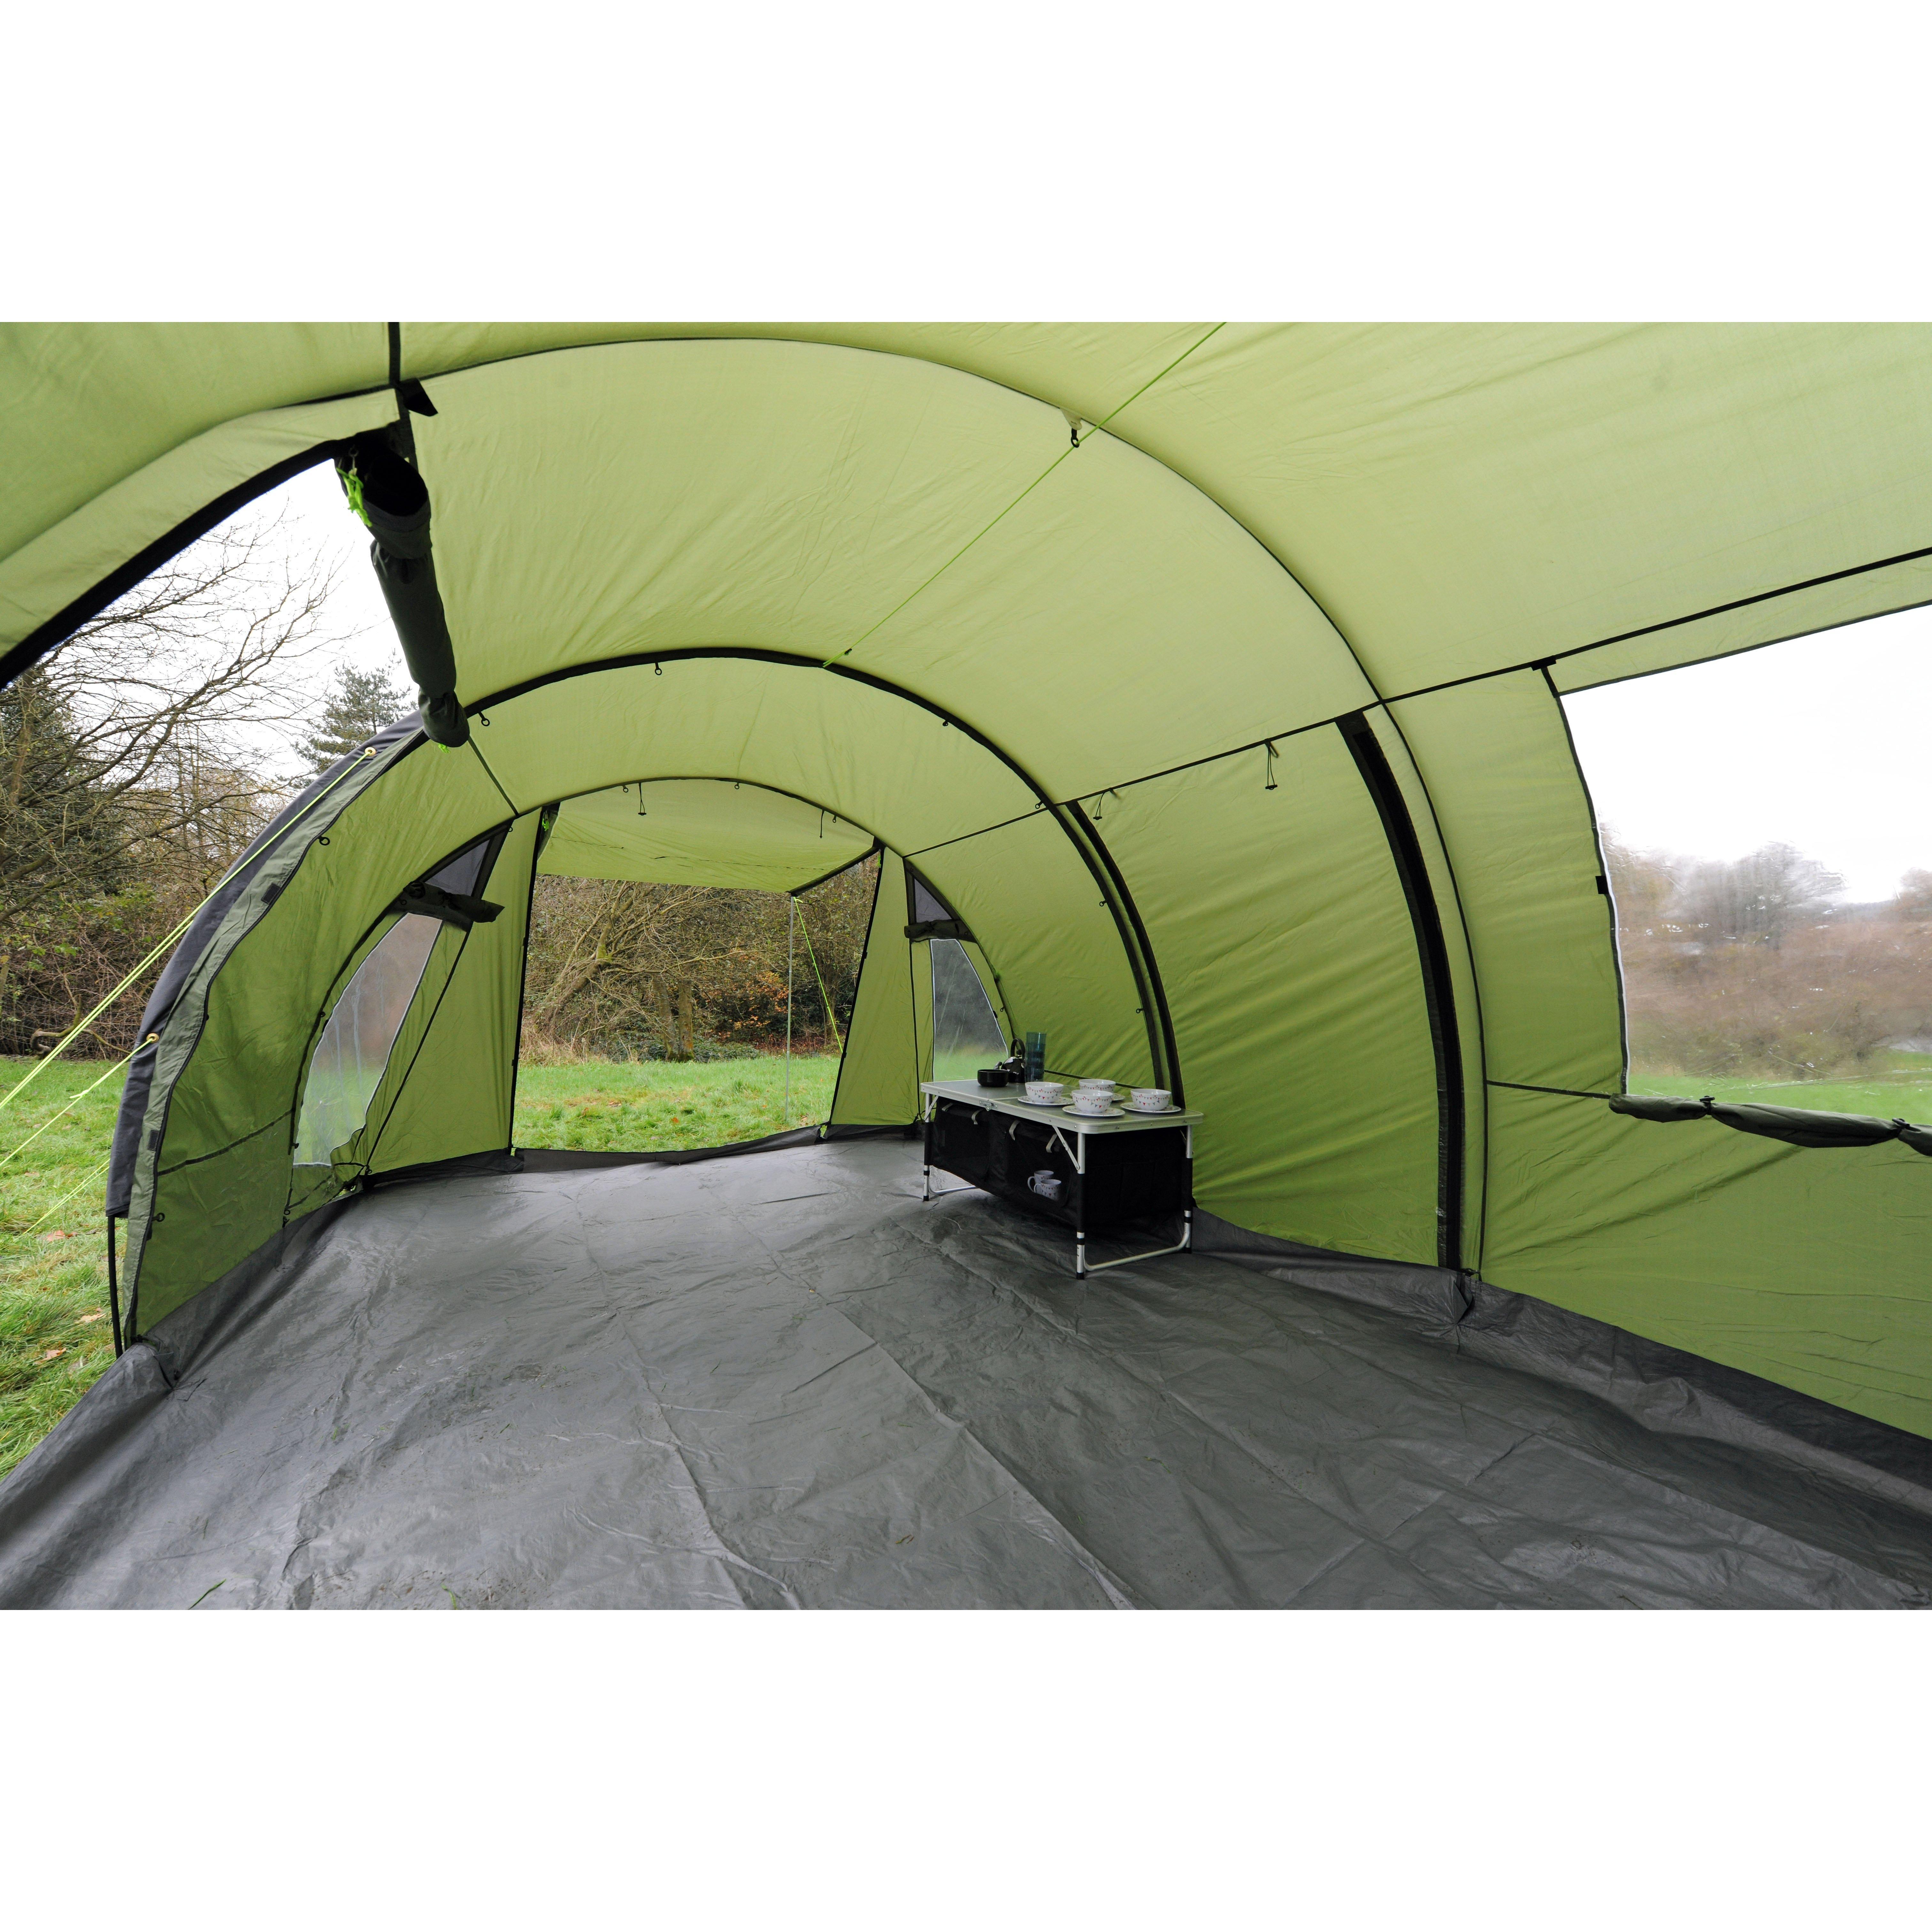 EUROHIKE Buckingham 8 Man Tent  sc 1 st  Millets & EUROHIKE Buckingham 8 Man Tent | Millets